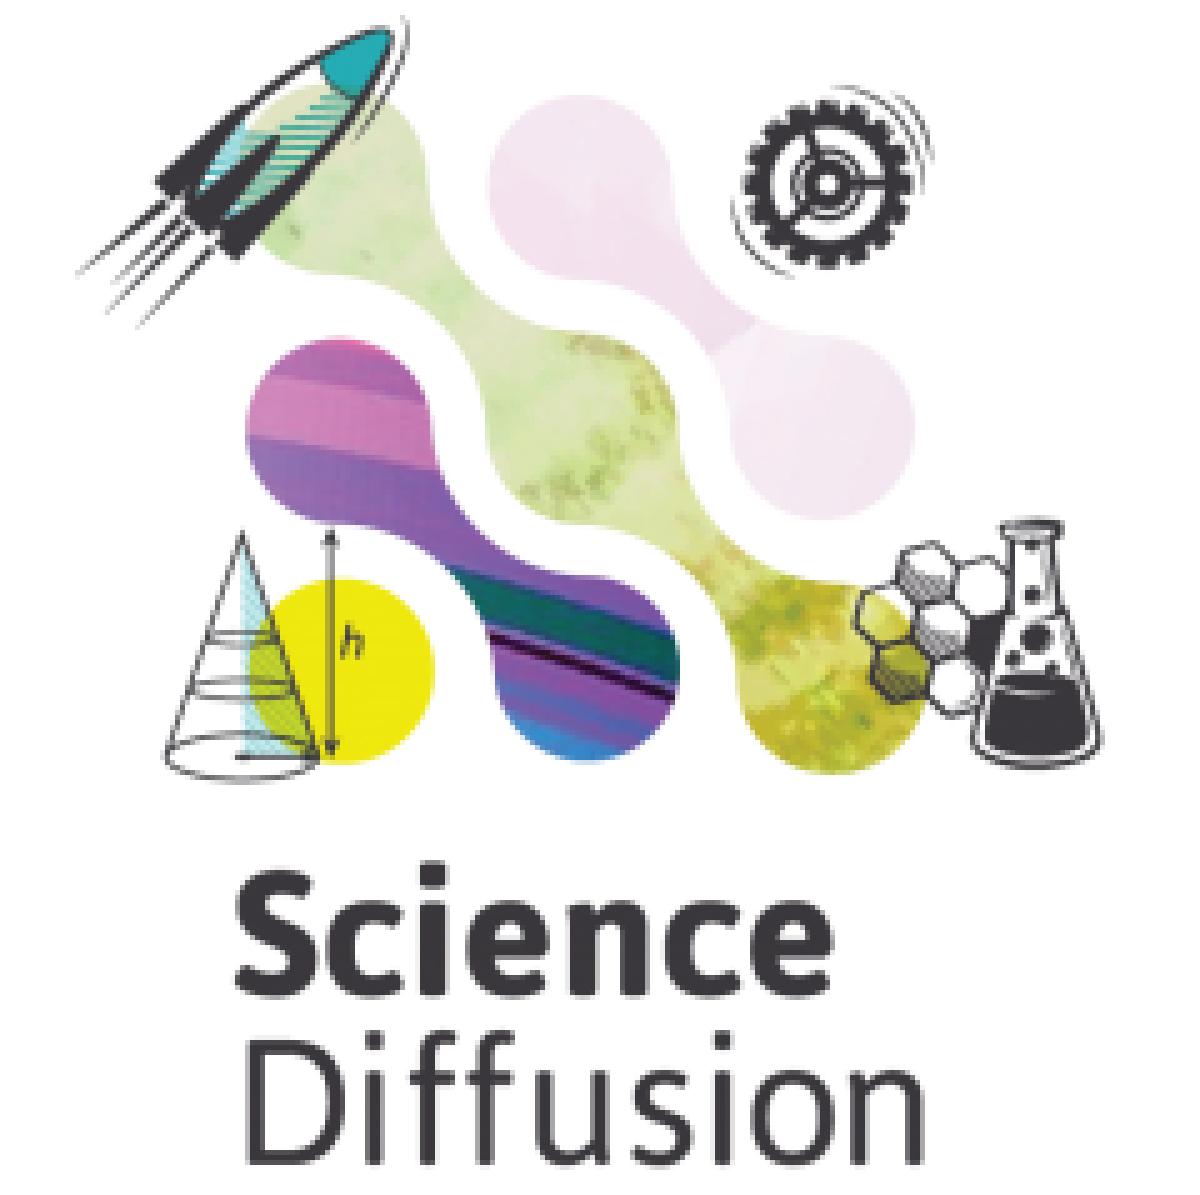 www.sciencediffusion.com